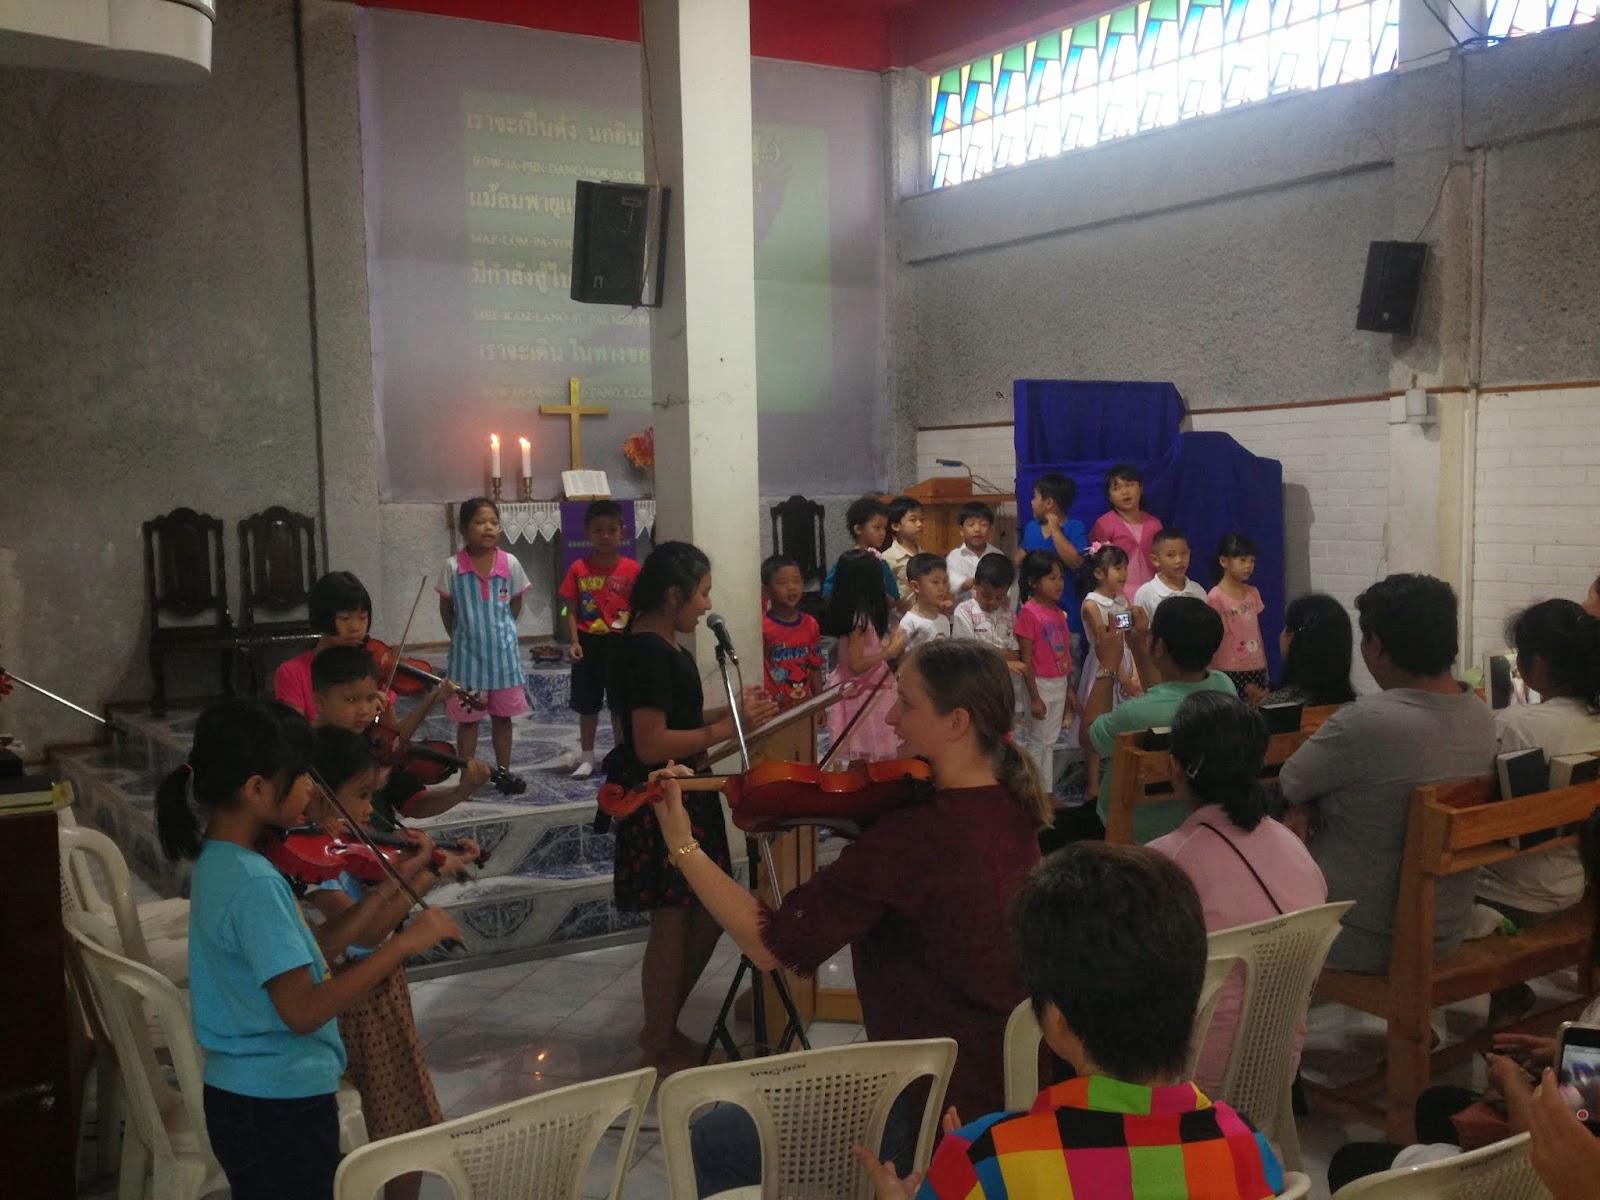 immanuel kirken bangkok